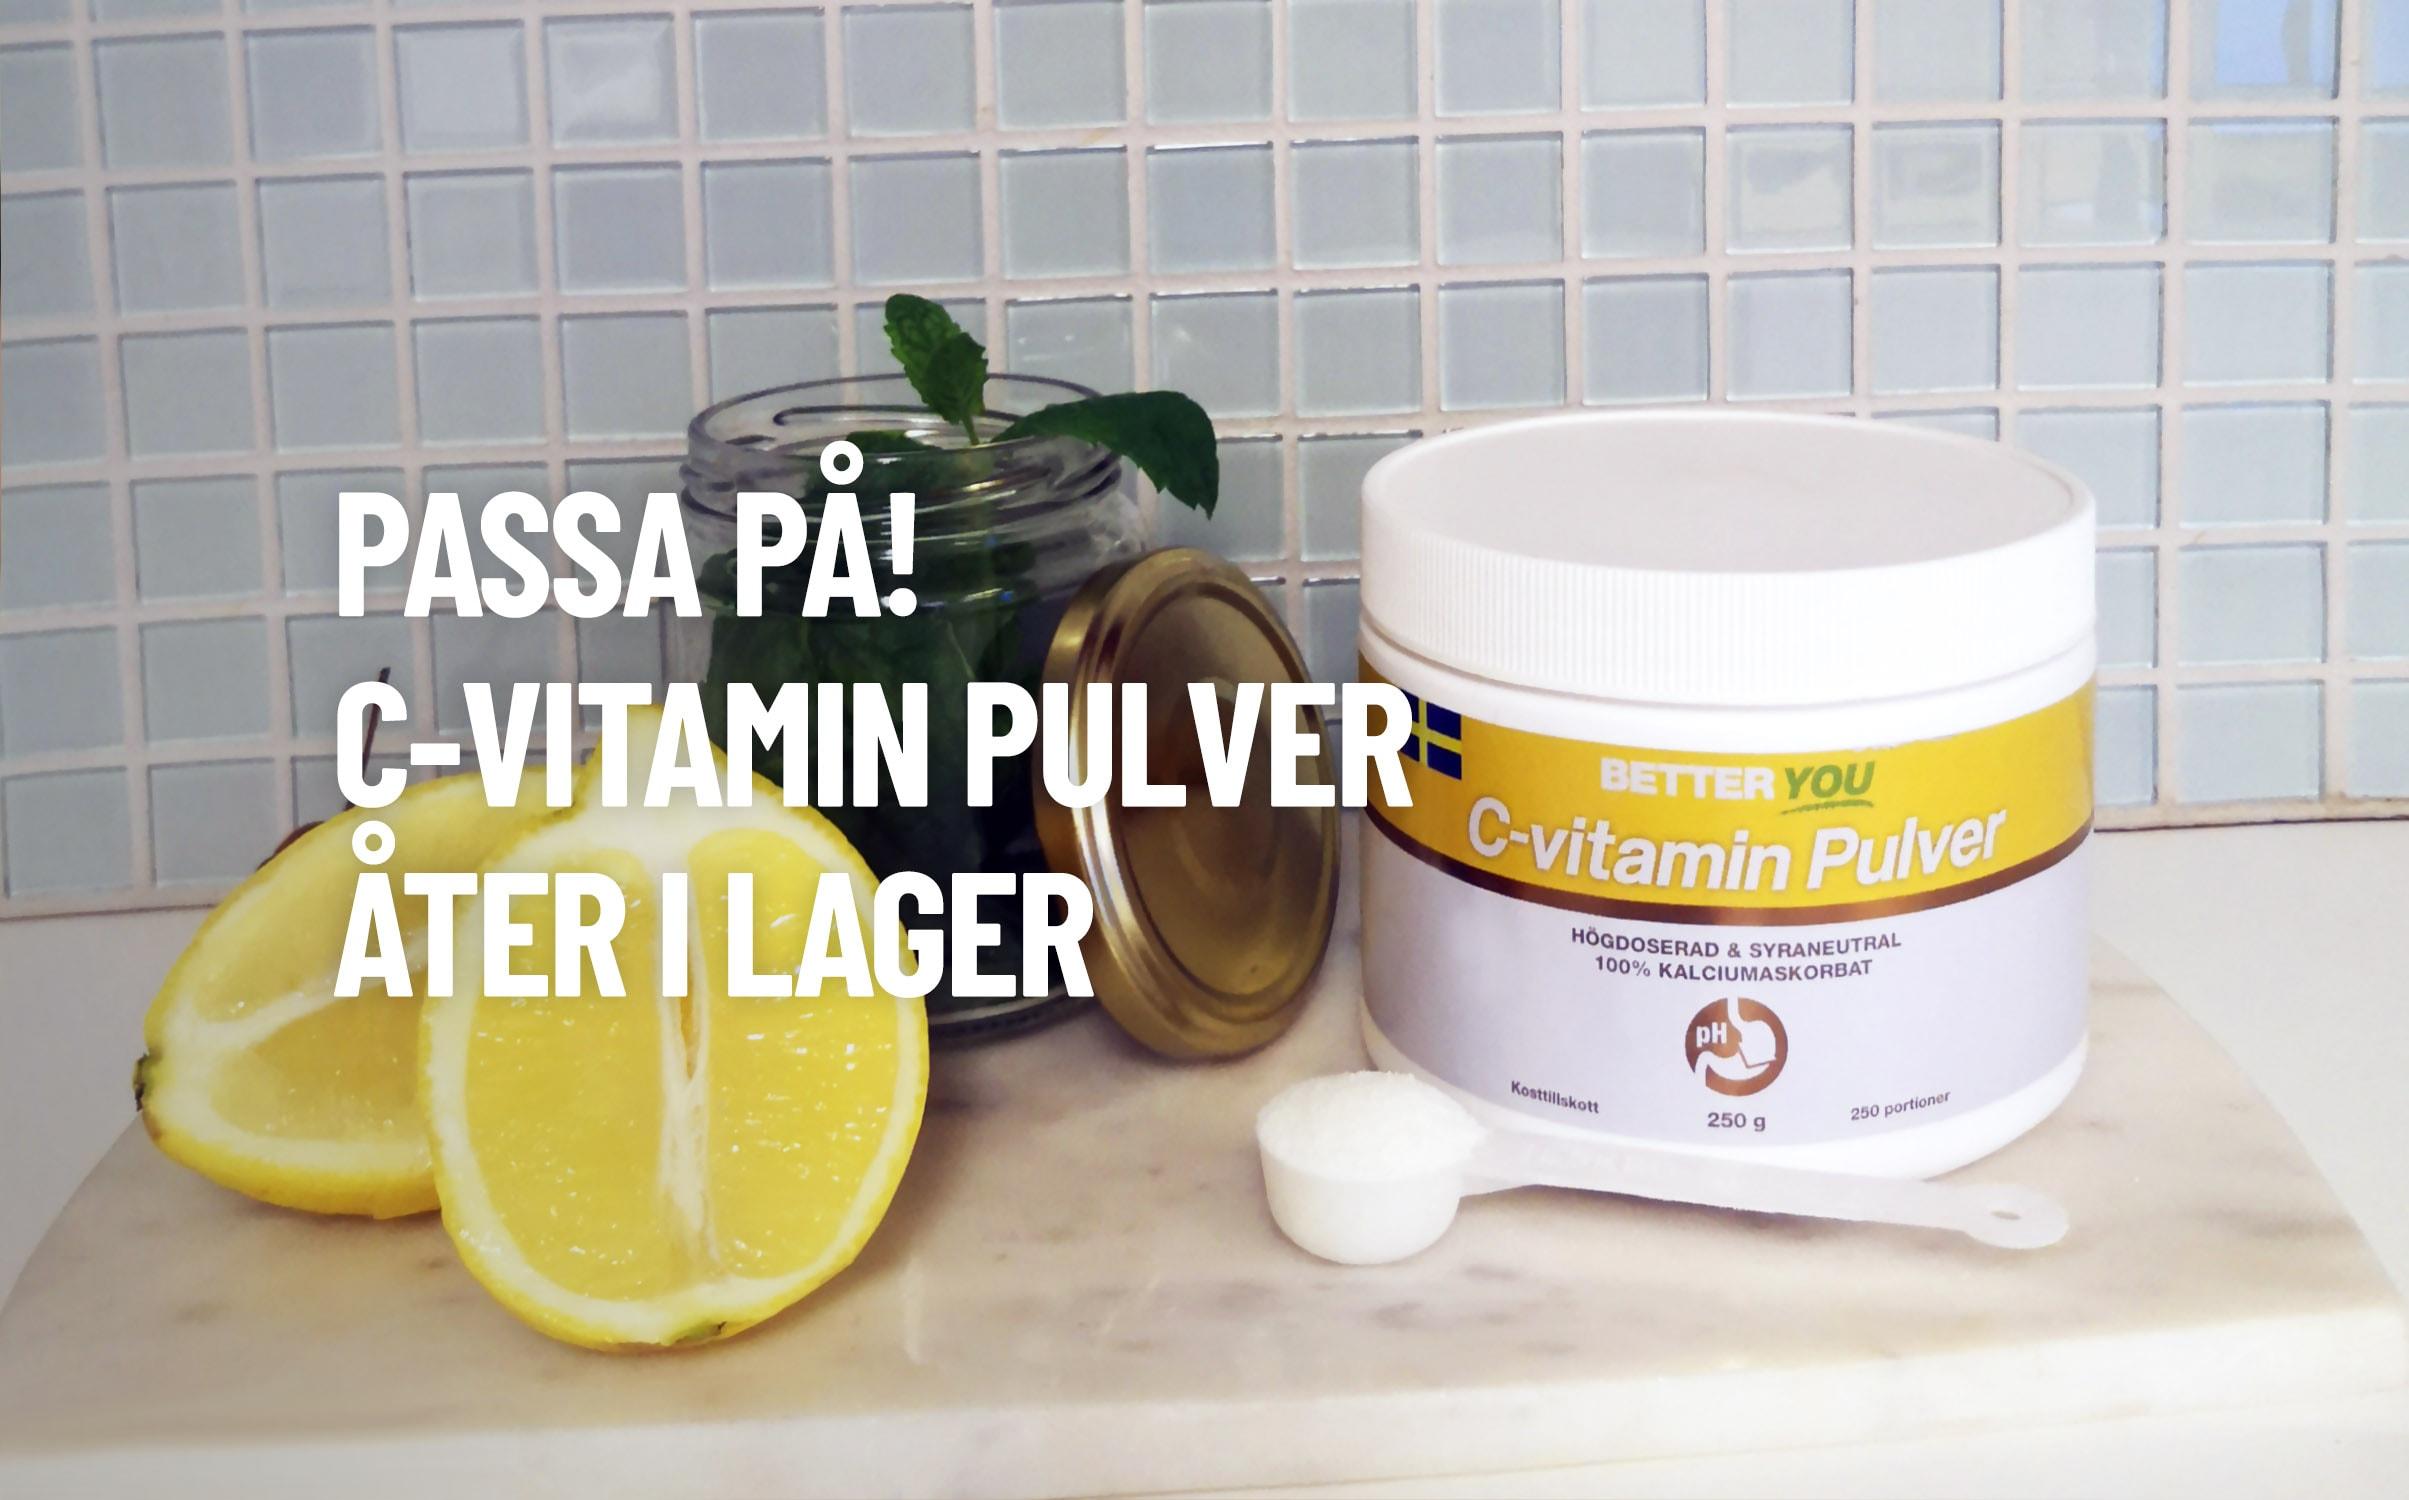 https://www.betteryou.se/pub_docs/files/Custom_Item_Images/Stora_snurr_c-vitamin_final.jpg